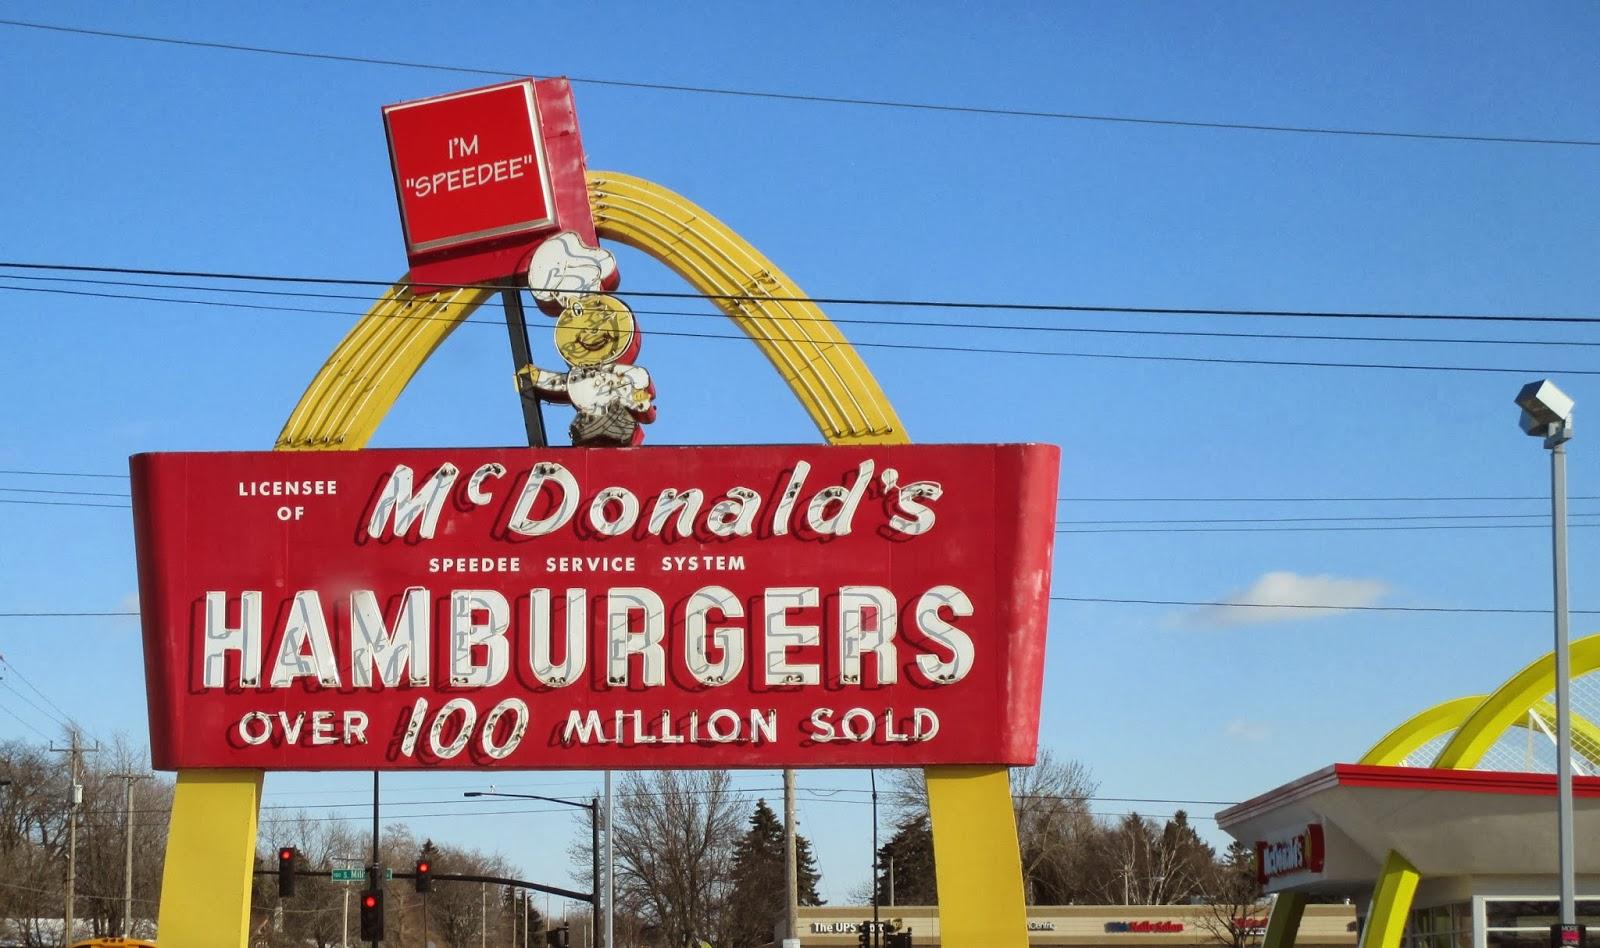 mcdonalds speedee service system